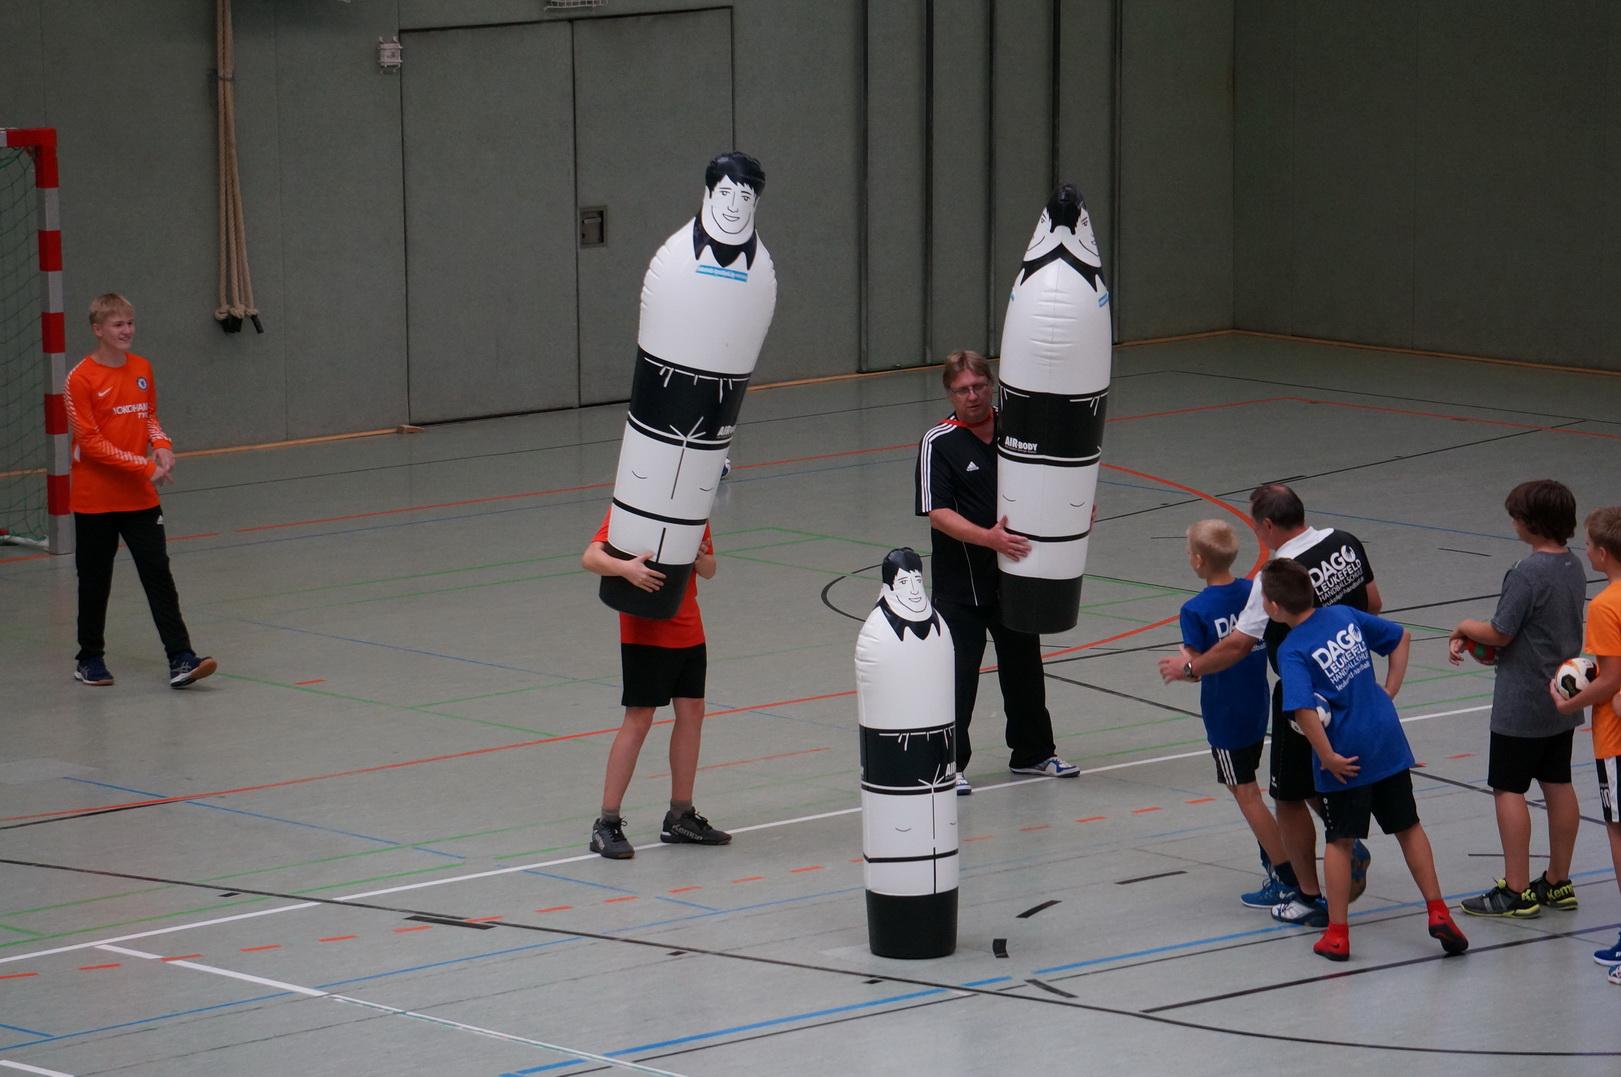 201808_Handballcamp_SDH_MG_257w